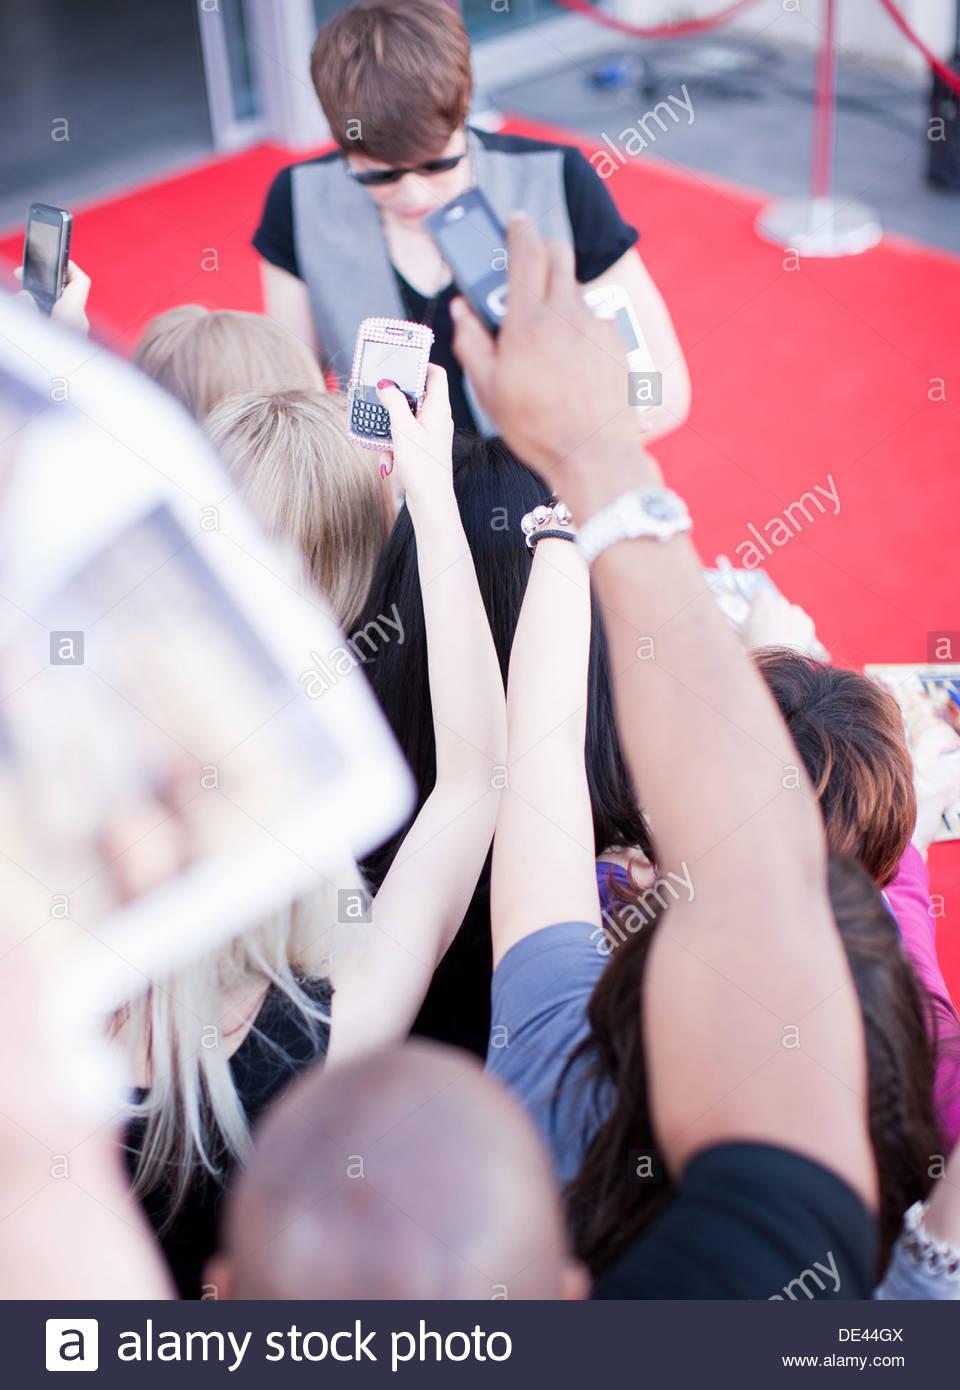 Celebrity signing autographs - Stock Image